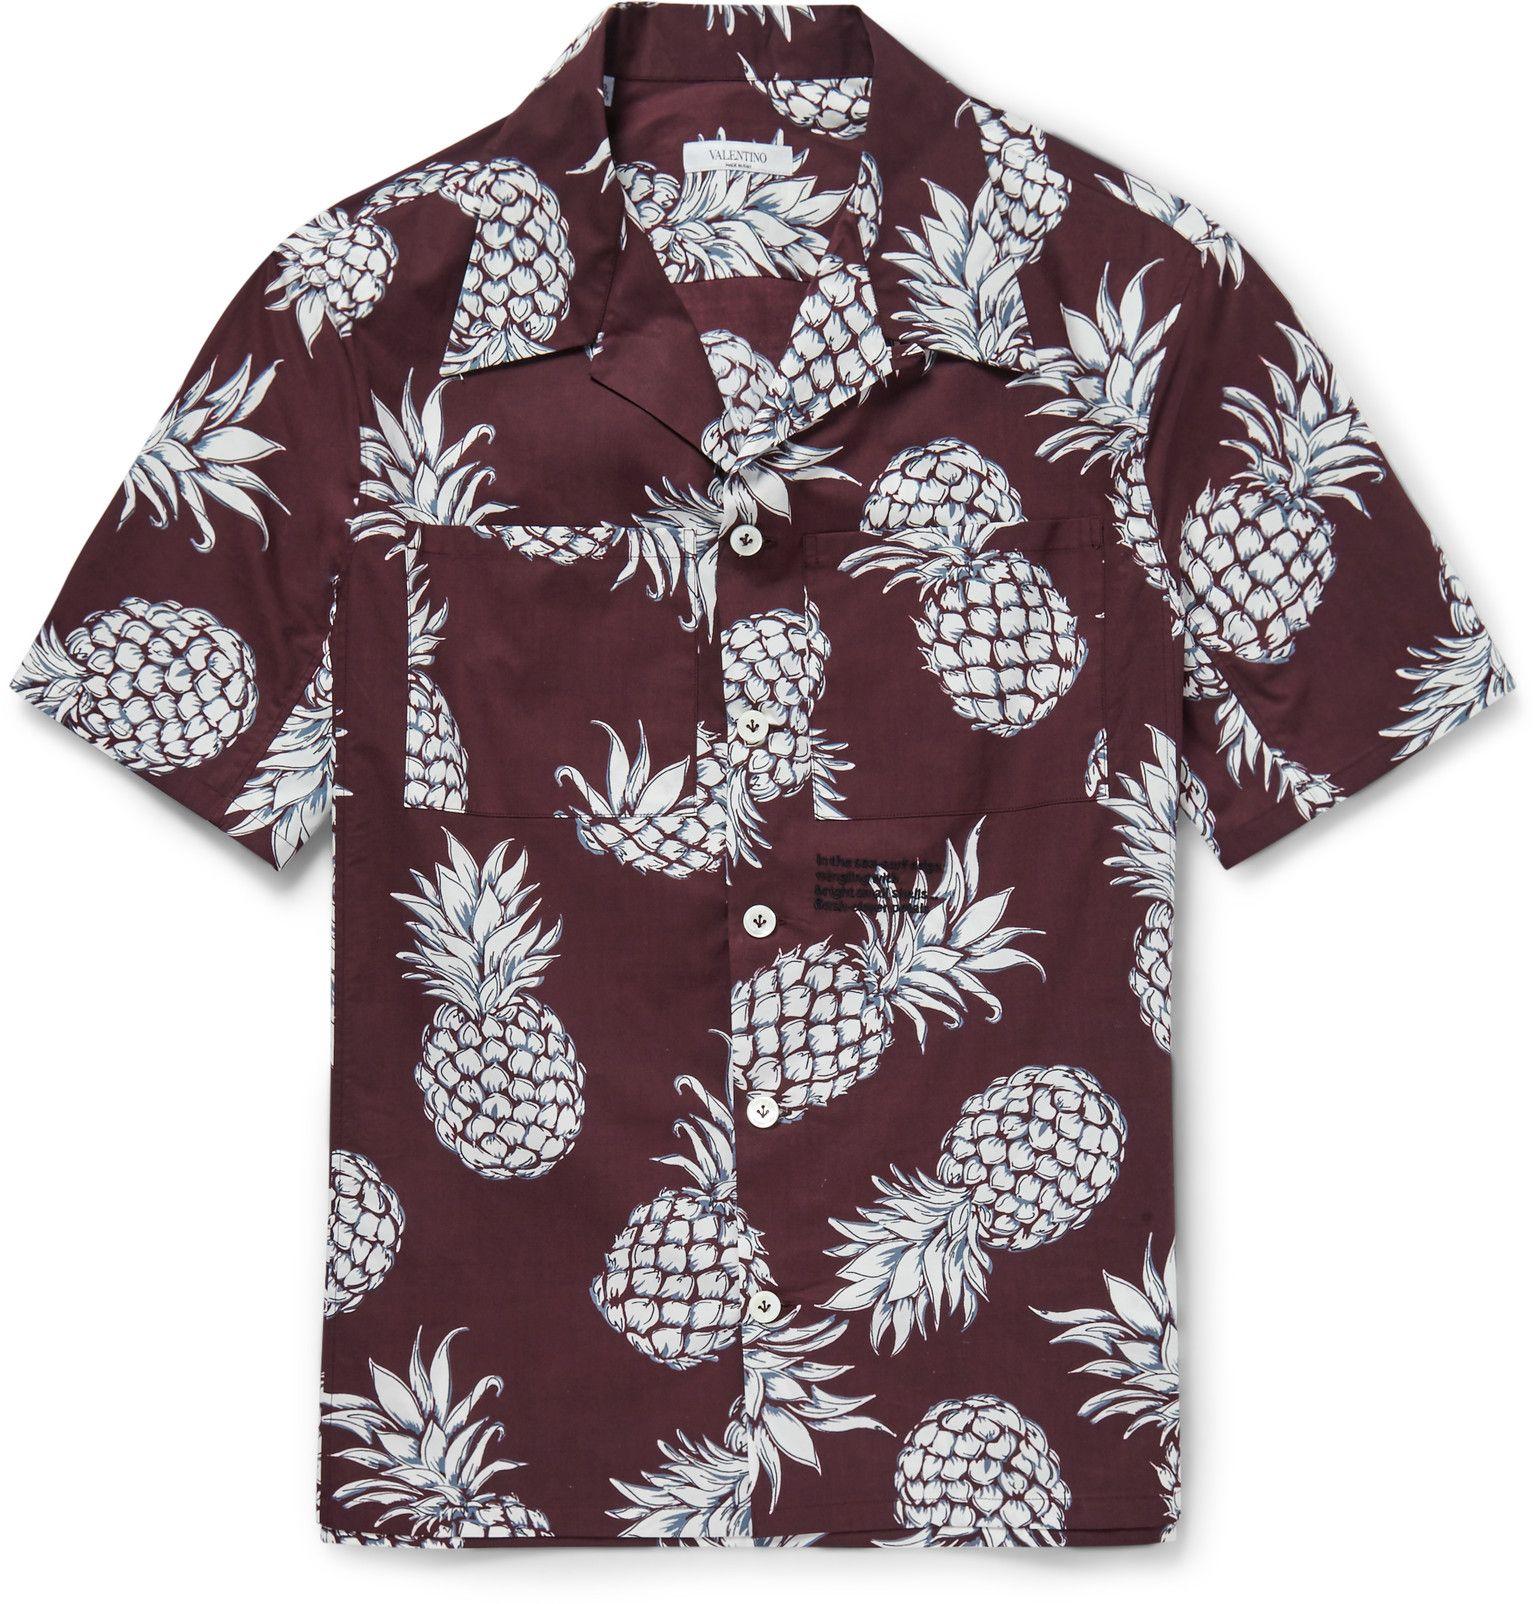 Casual Shirts for Men | Designer Menswear